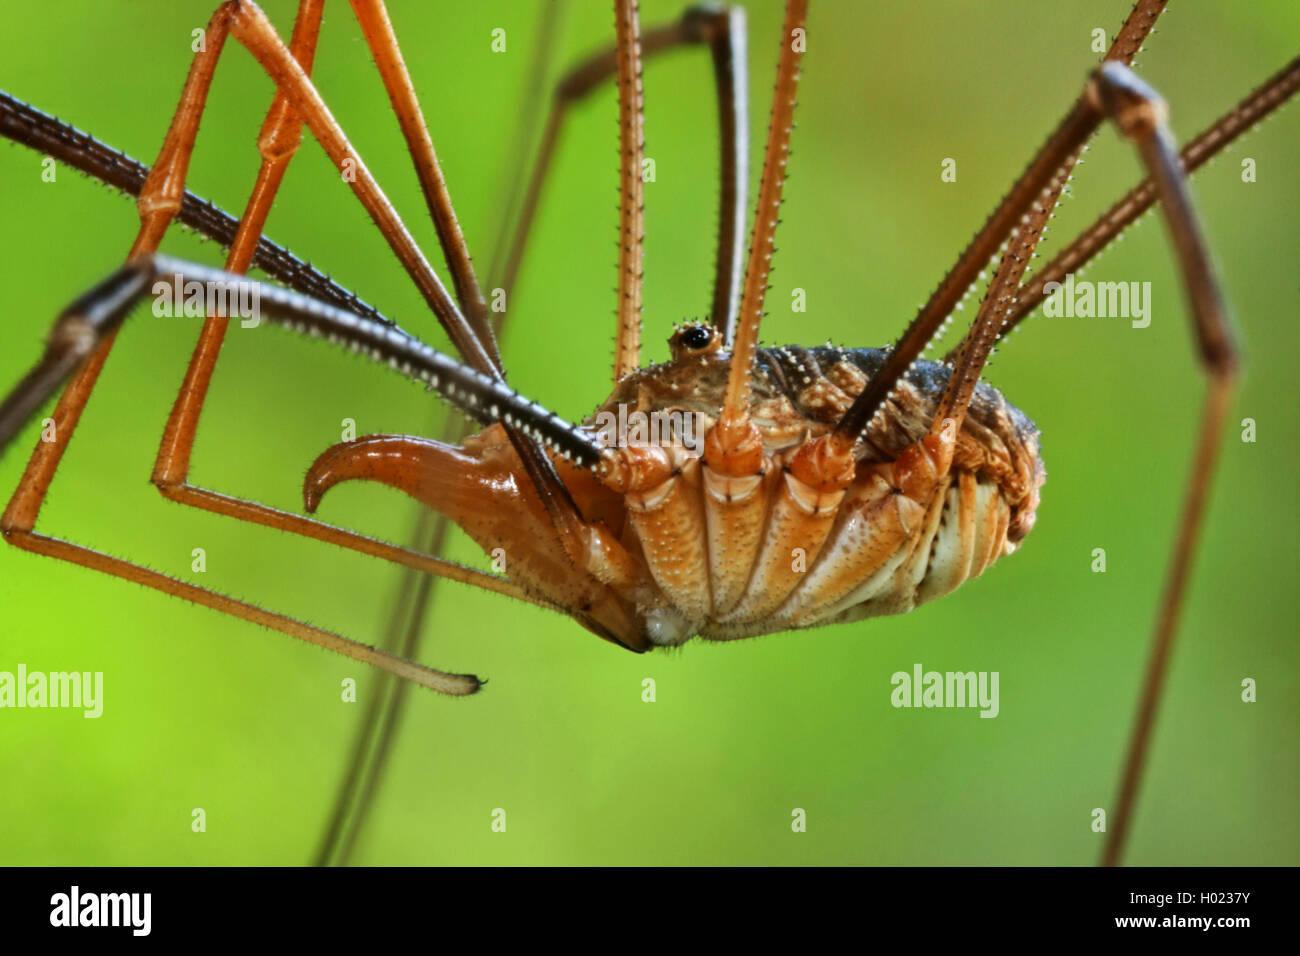 Gemeiner Weberknecht (Phalangium opilio), Detail, Deutschland | Common harvestman, Daddy longleg (Phalangium opilio), - Stock Image